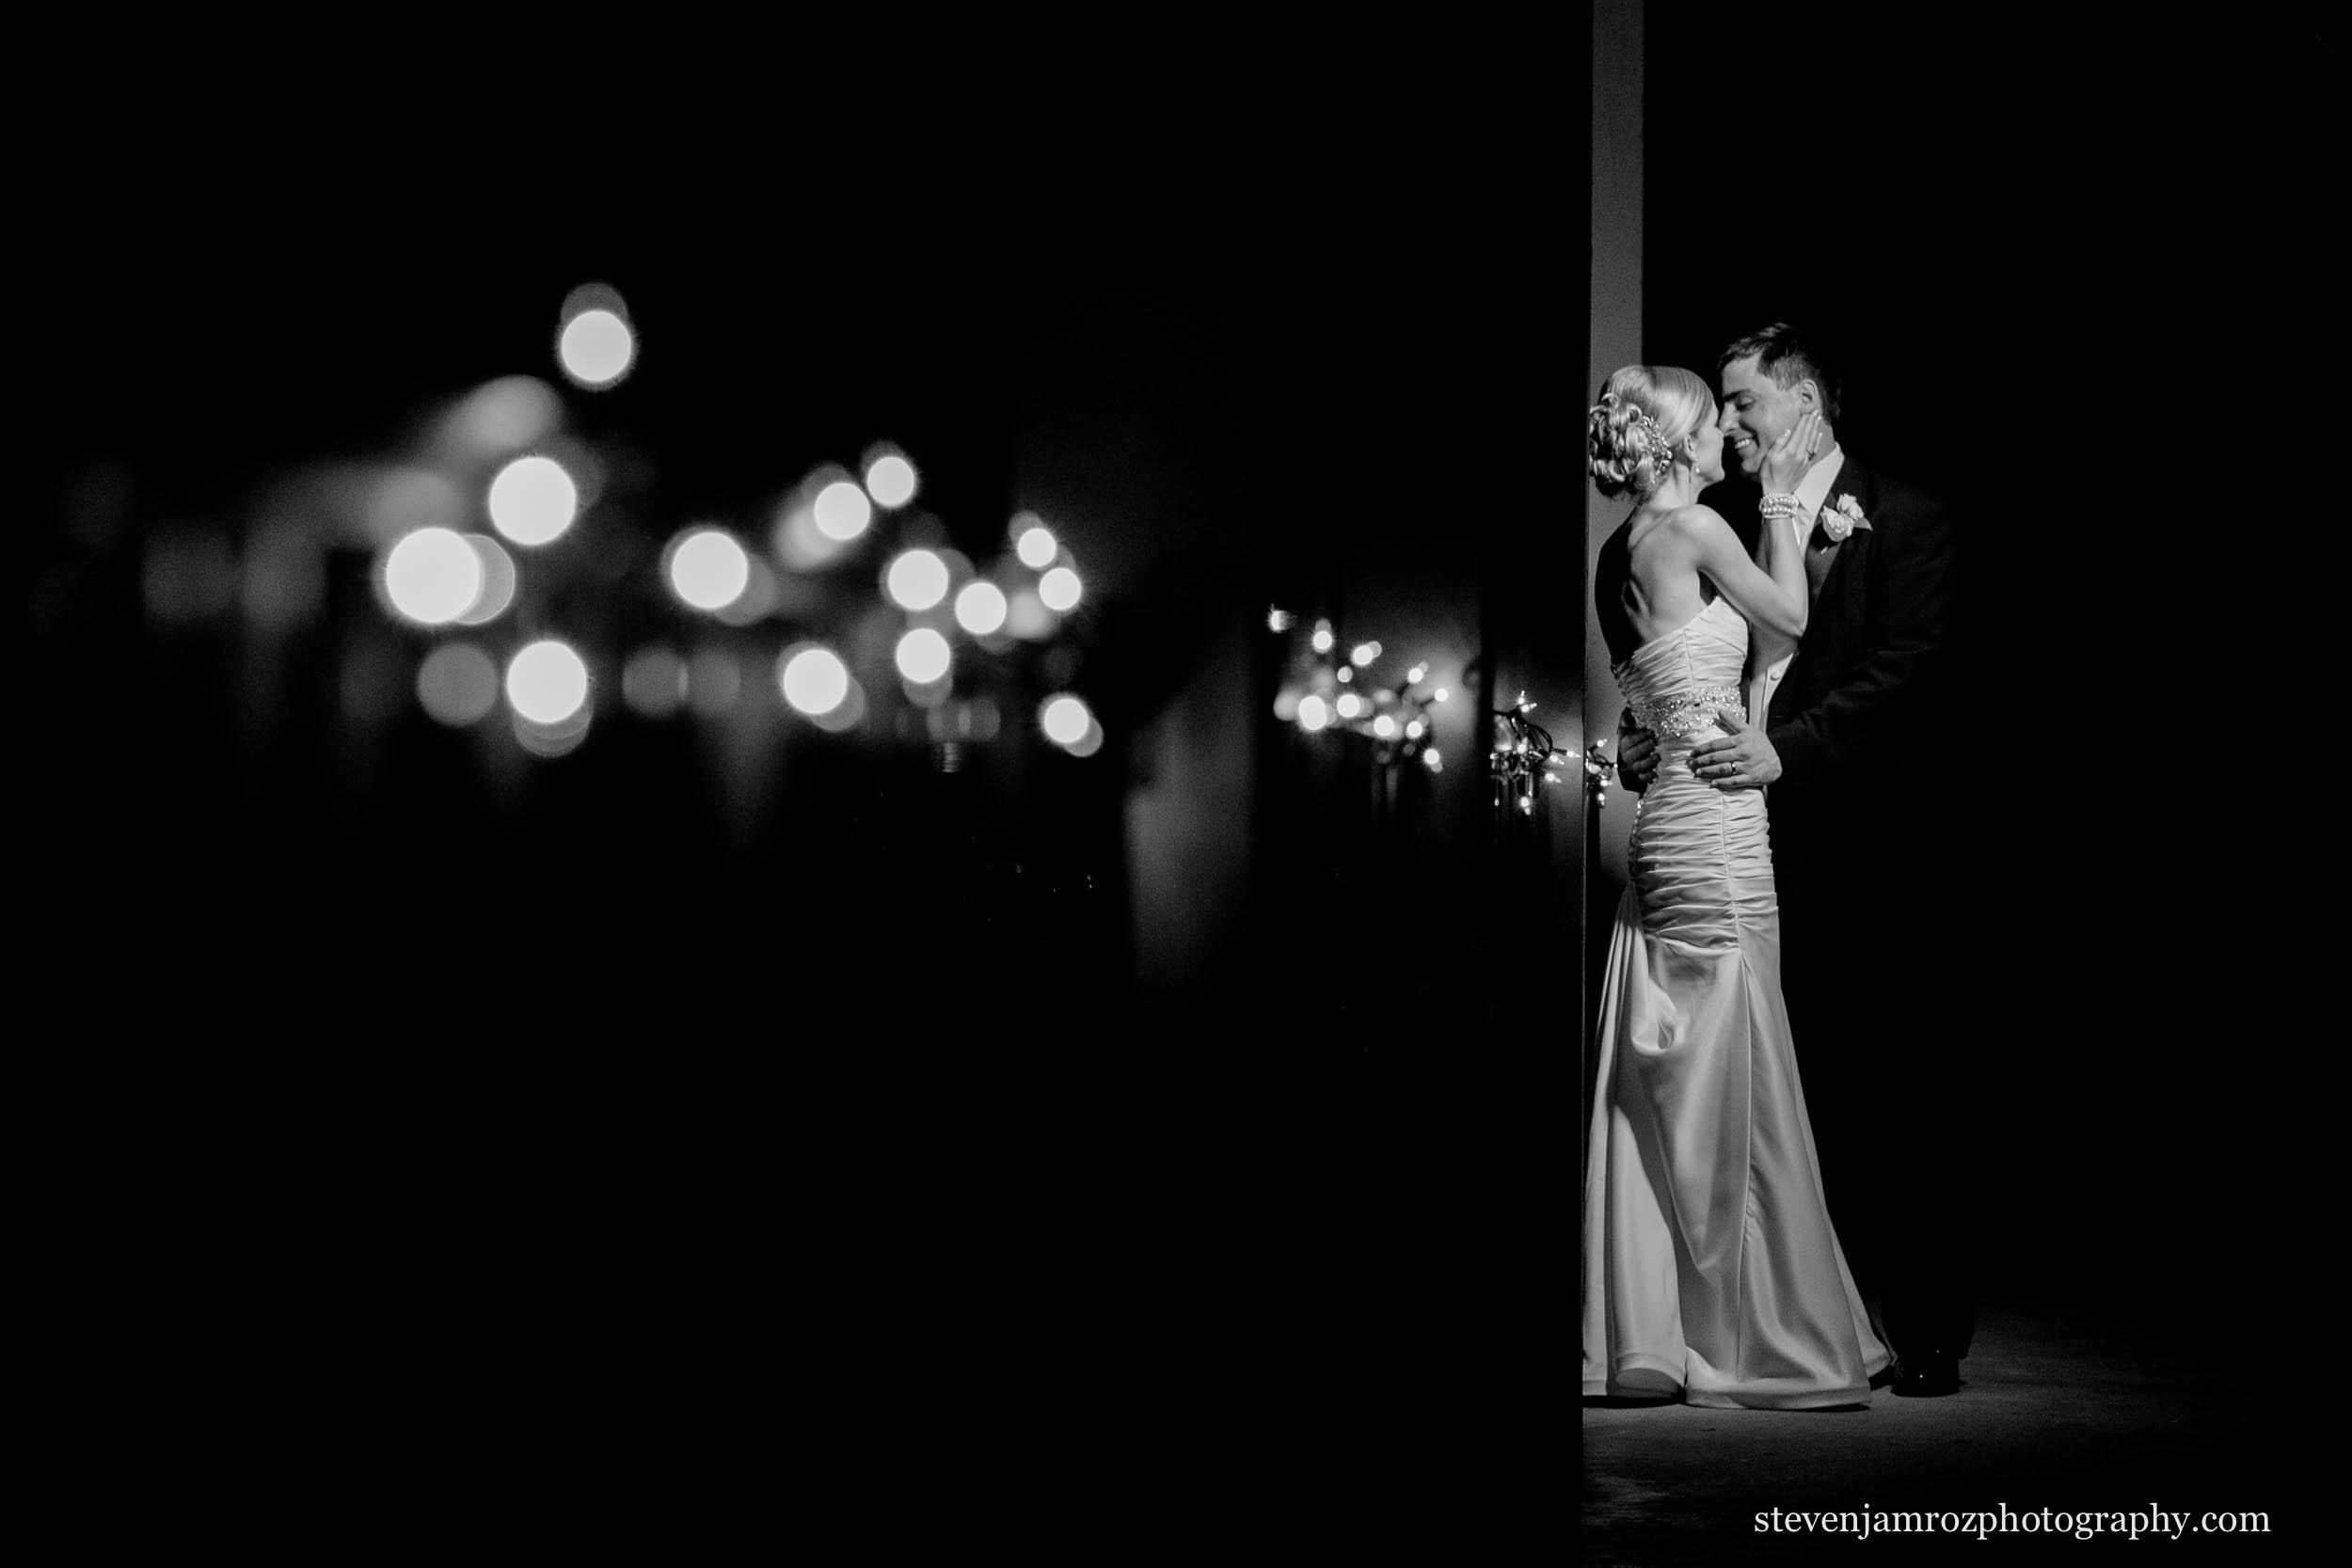 durant-park-wedding-raleigh-nc-steven-jamroz-photography-0206.jpg